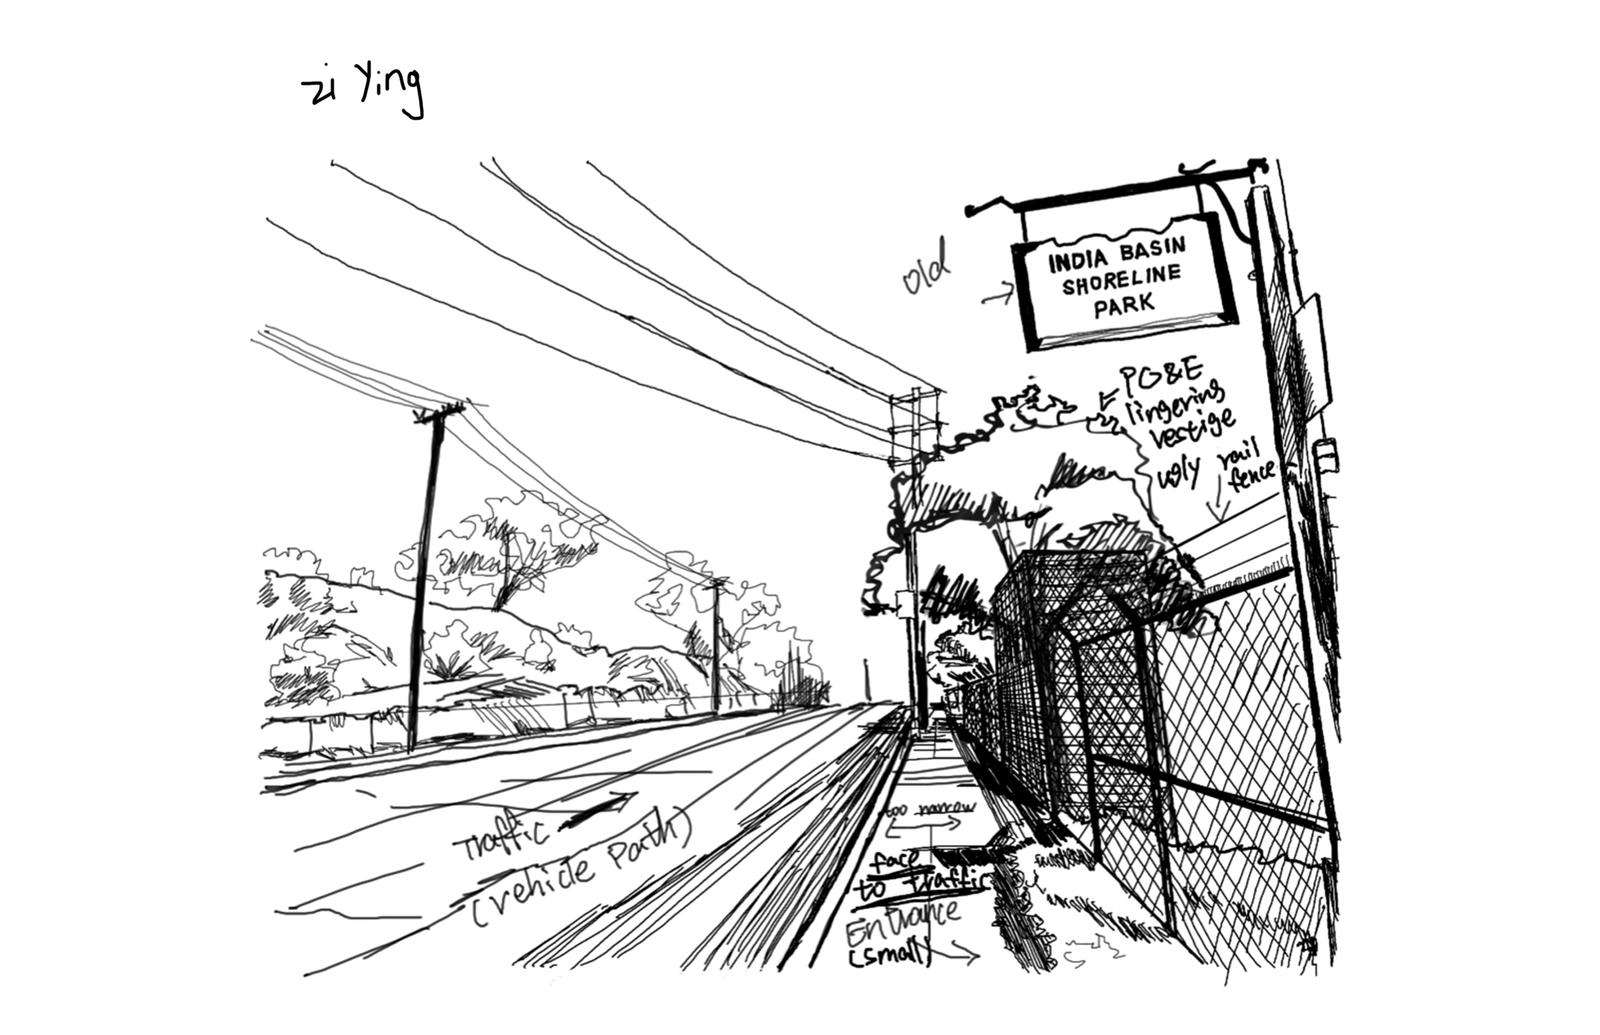 Site Analysis Sketch 5 – India Basin Park, San Francisco